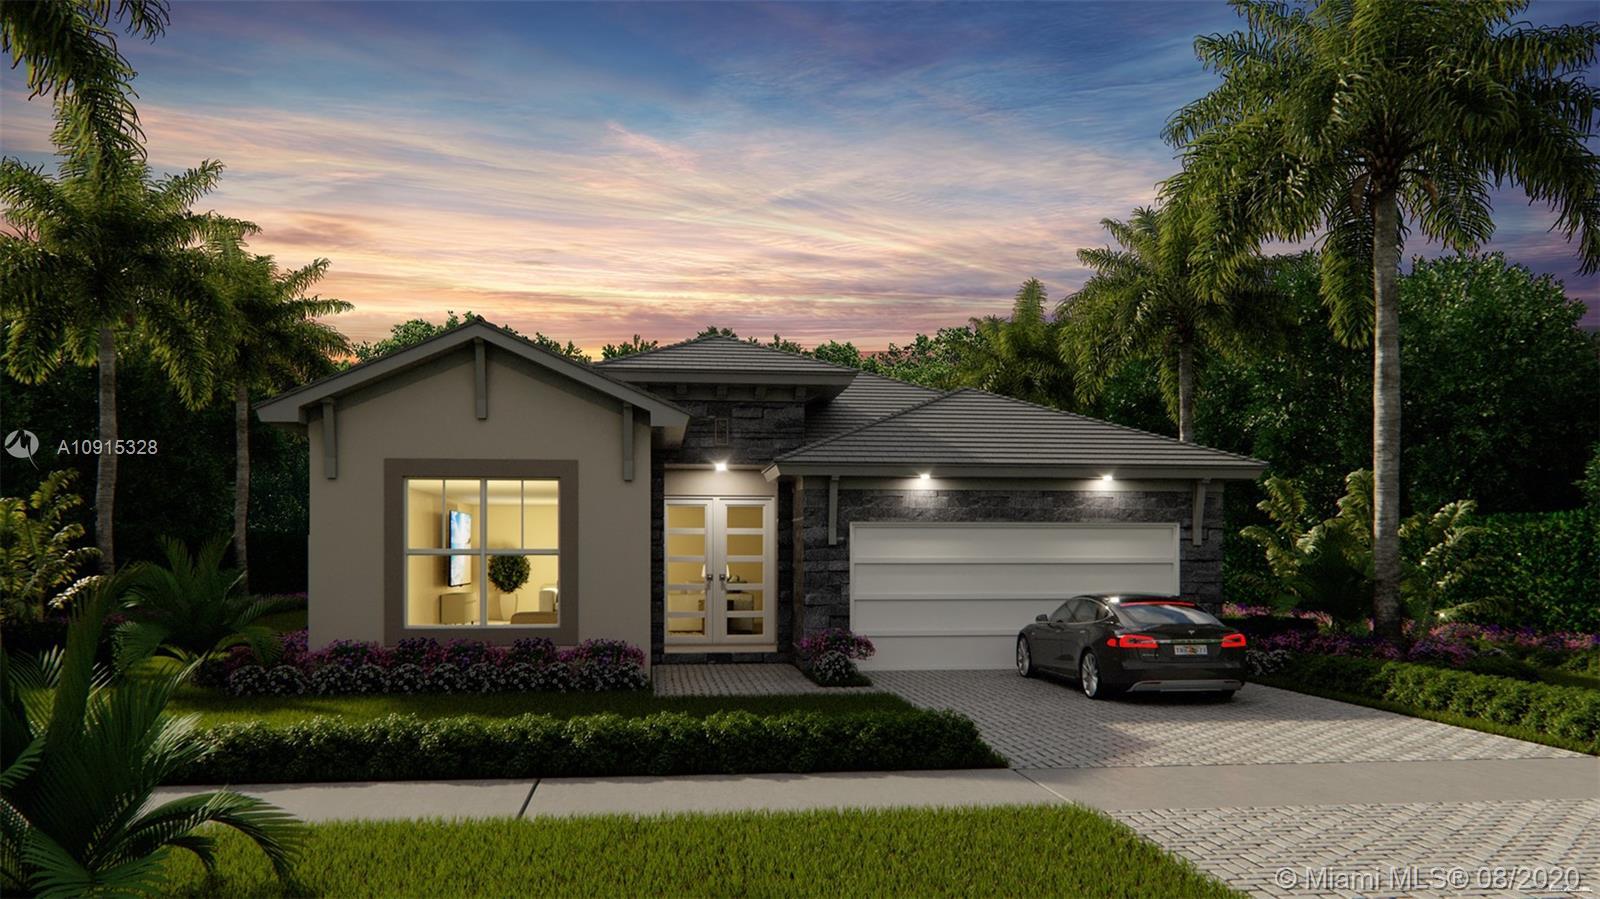 29125 SW 165 AVE Property Photo